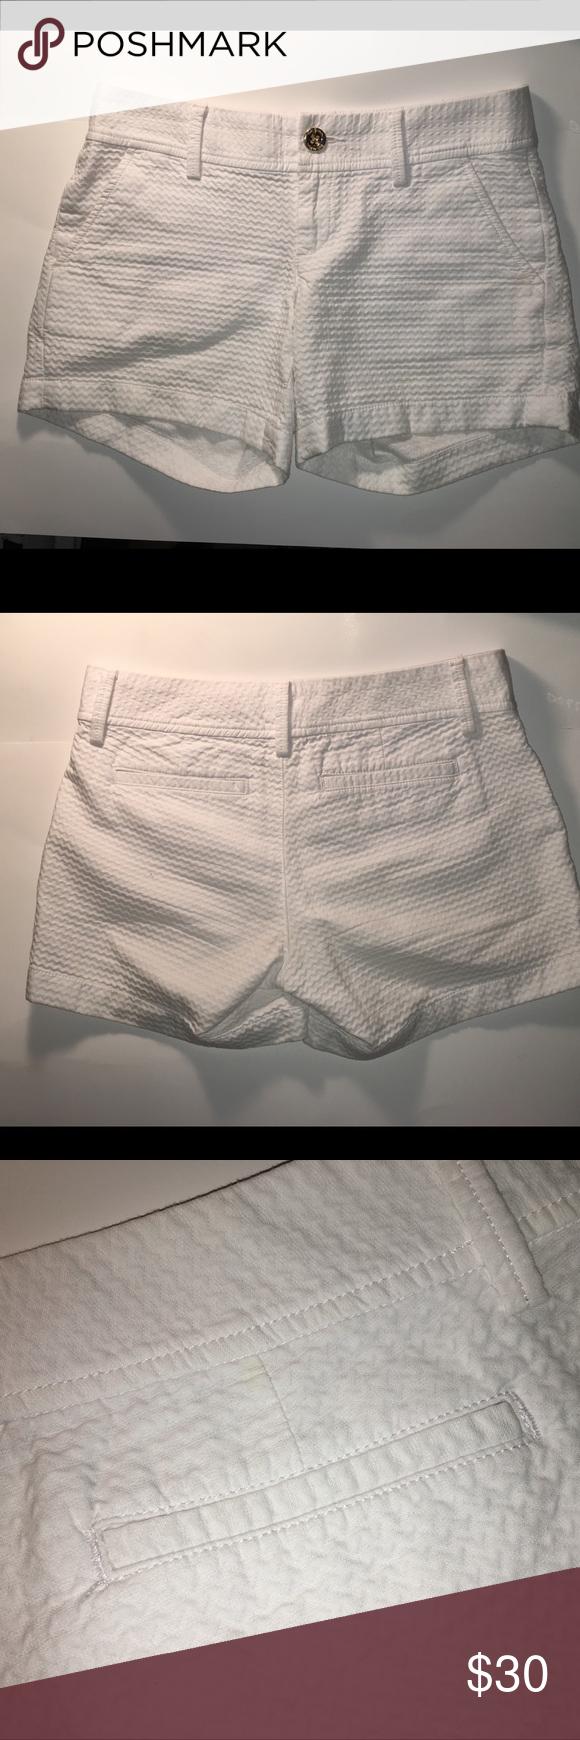 a54a0fbb5cc30c Lilly Pulitzer White Callahan Shorts - Size 0 Lilly Pulitzer White The Callahan  Shorts Size 0